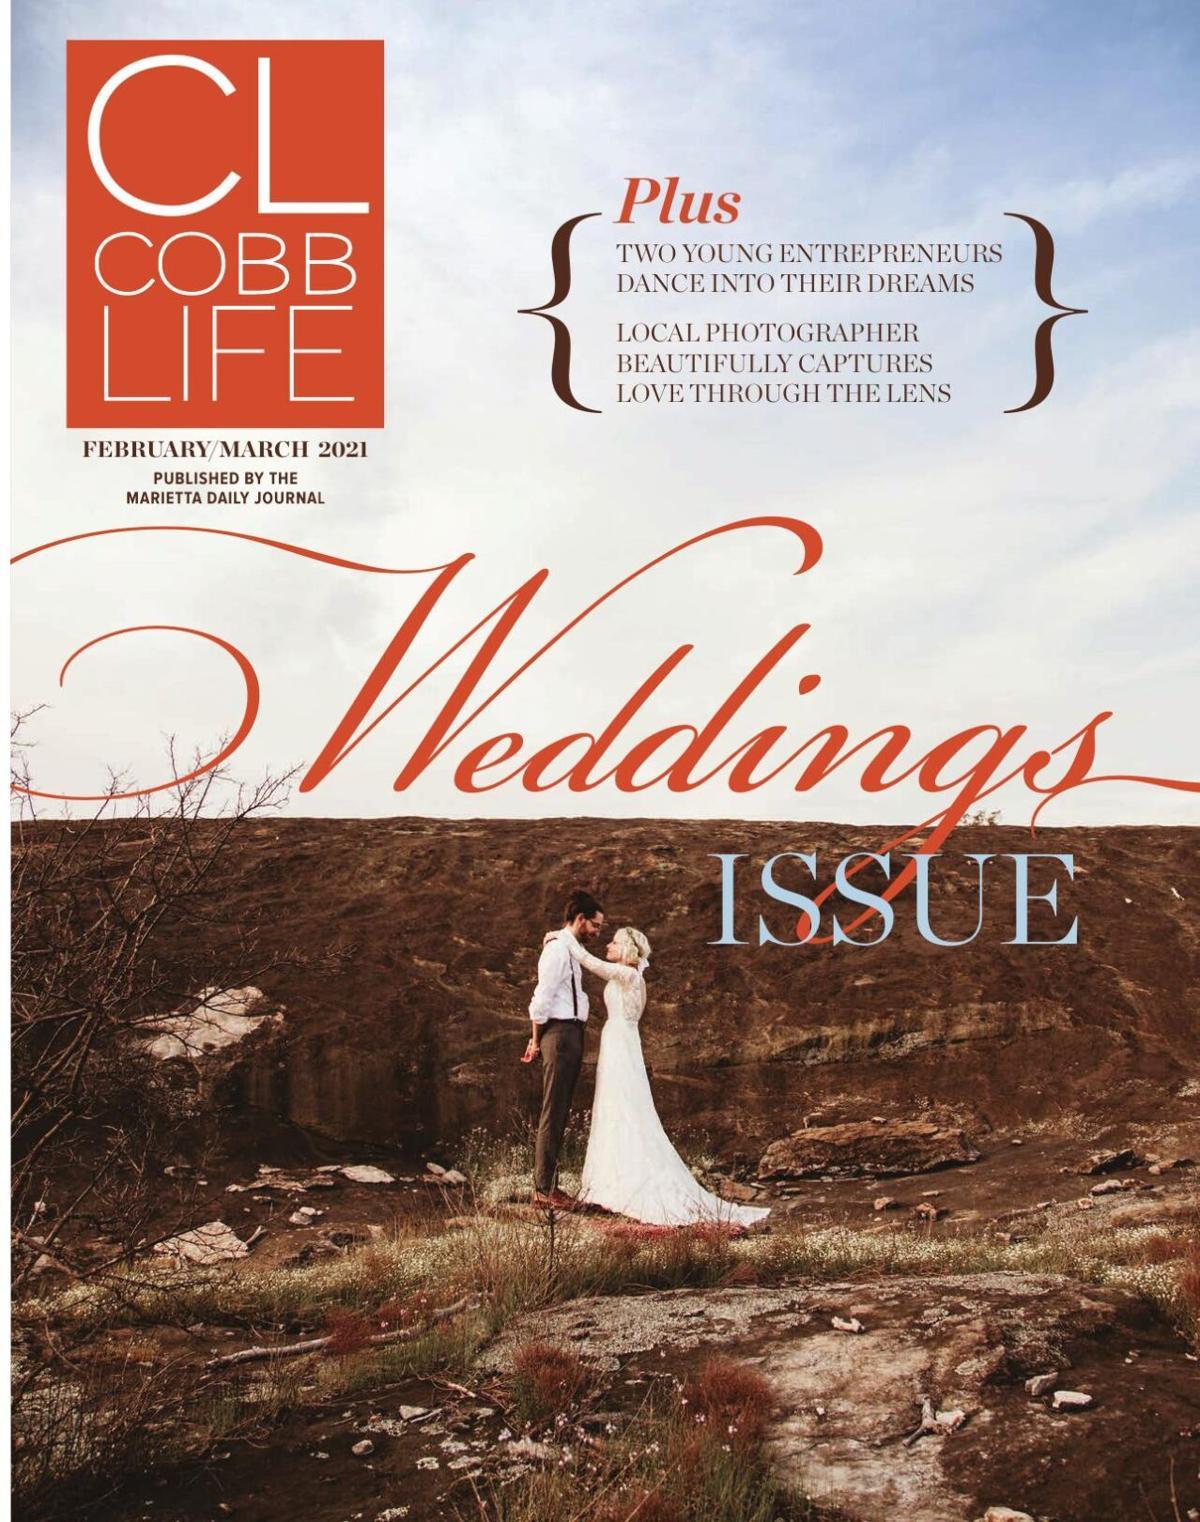 Cobb Life Weddings 2021